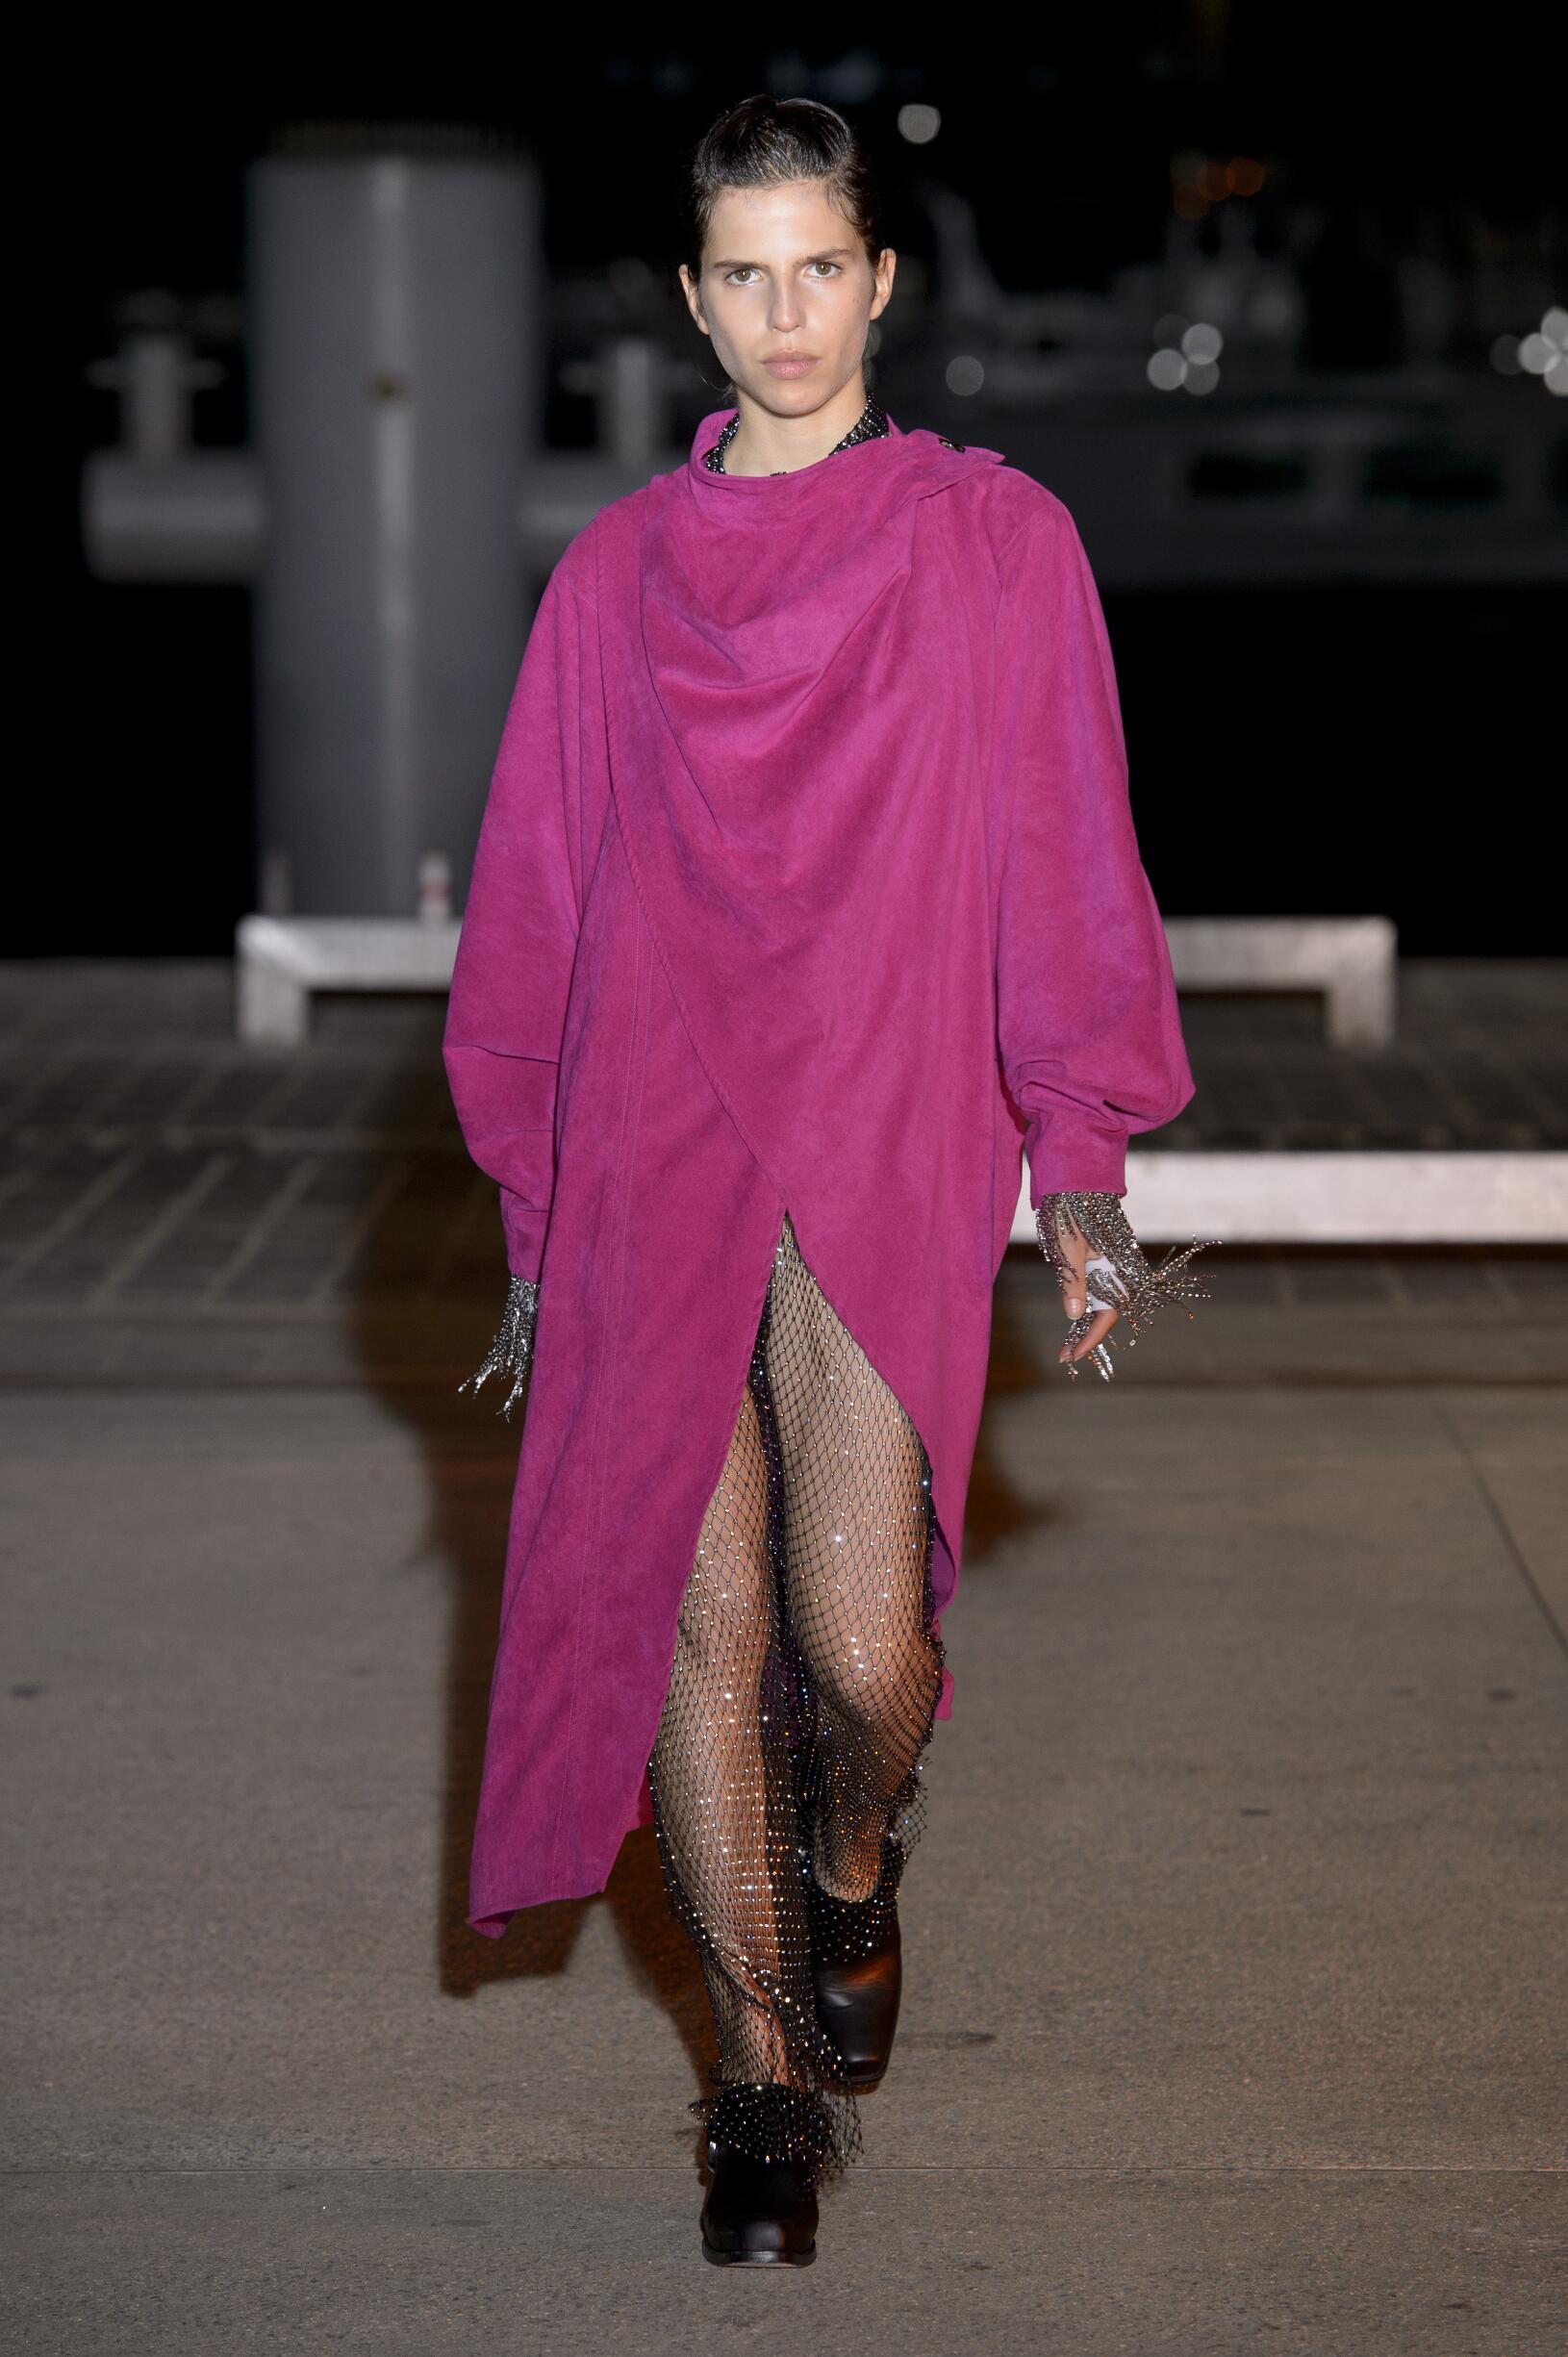 Wanda Nylon 2017